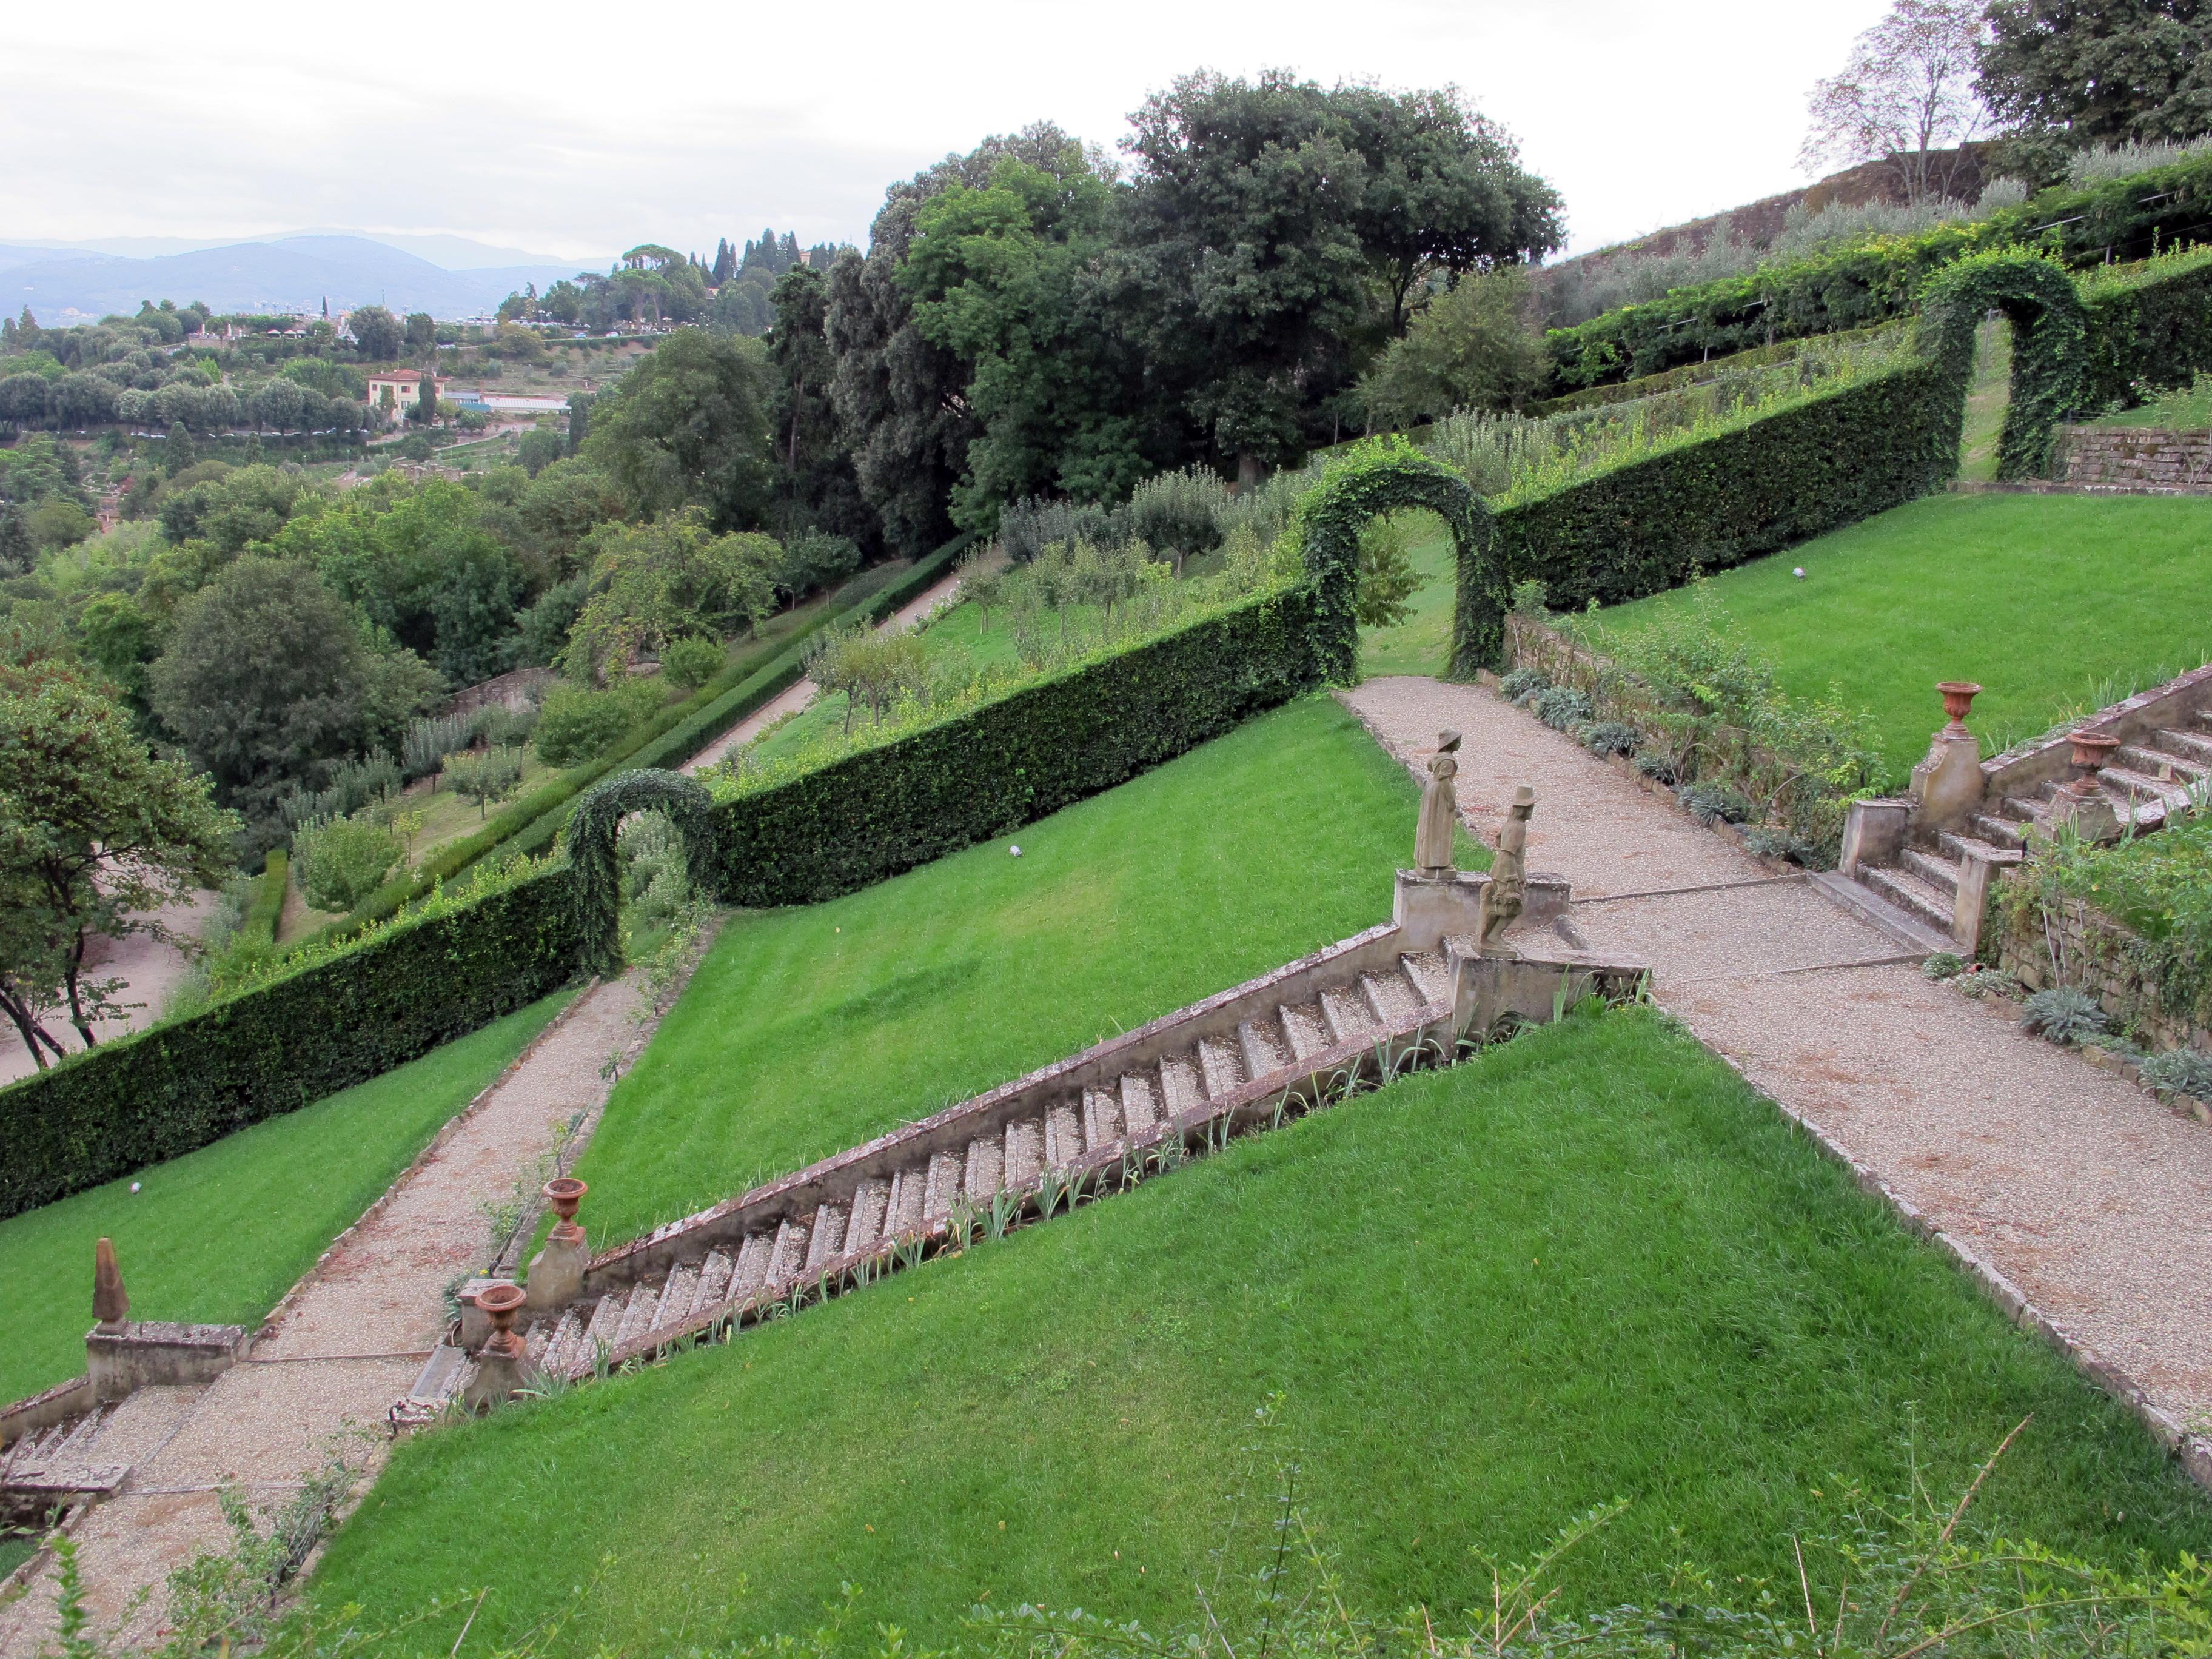 Fichier giardino bardini terrazzamenti 02 jpg wikip dia - Terrazzamenti giardino ...